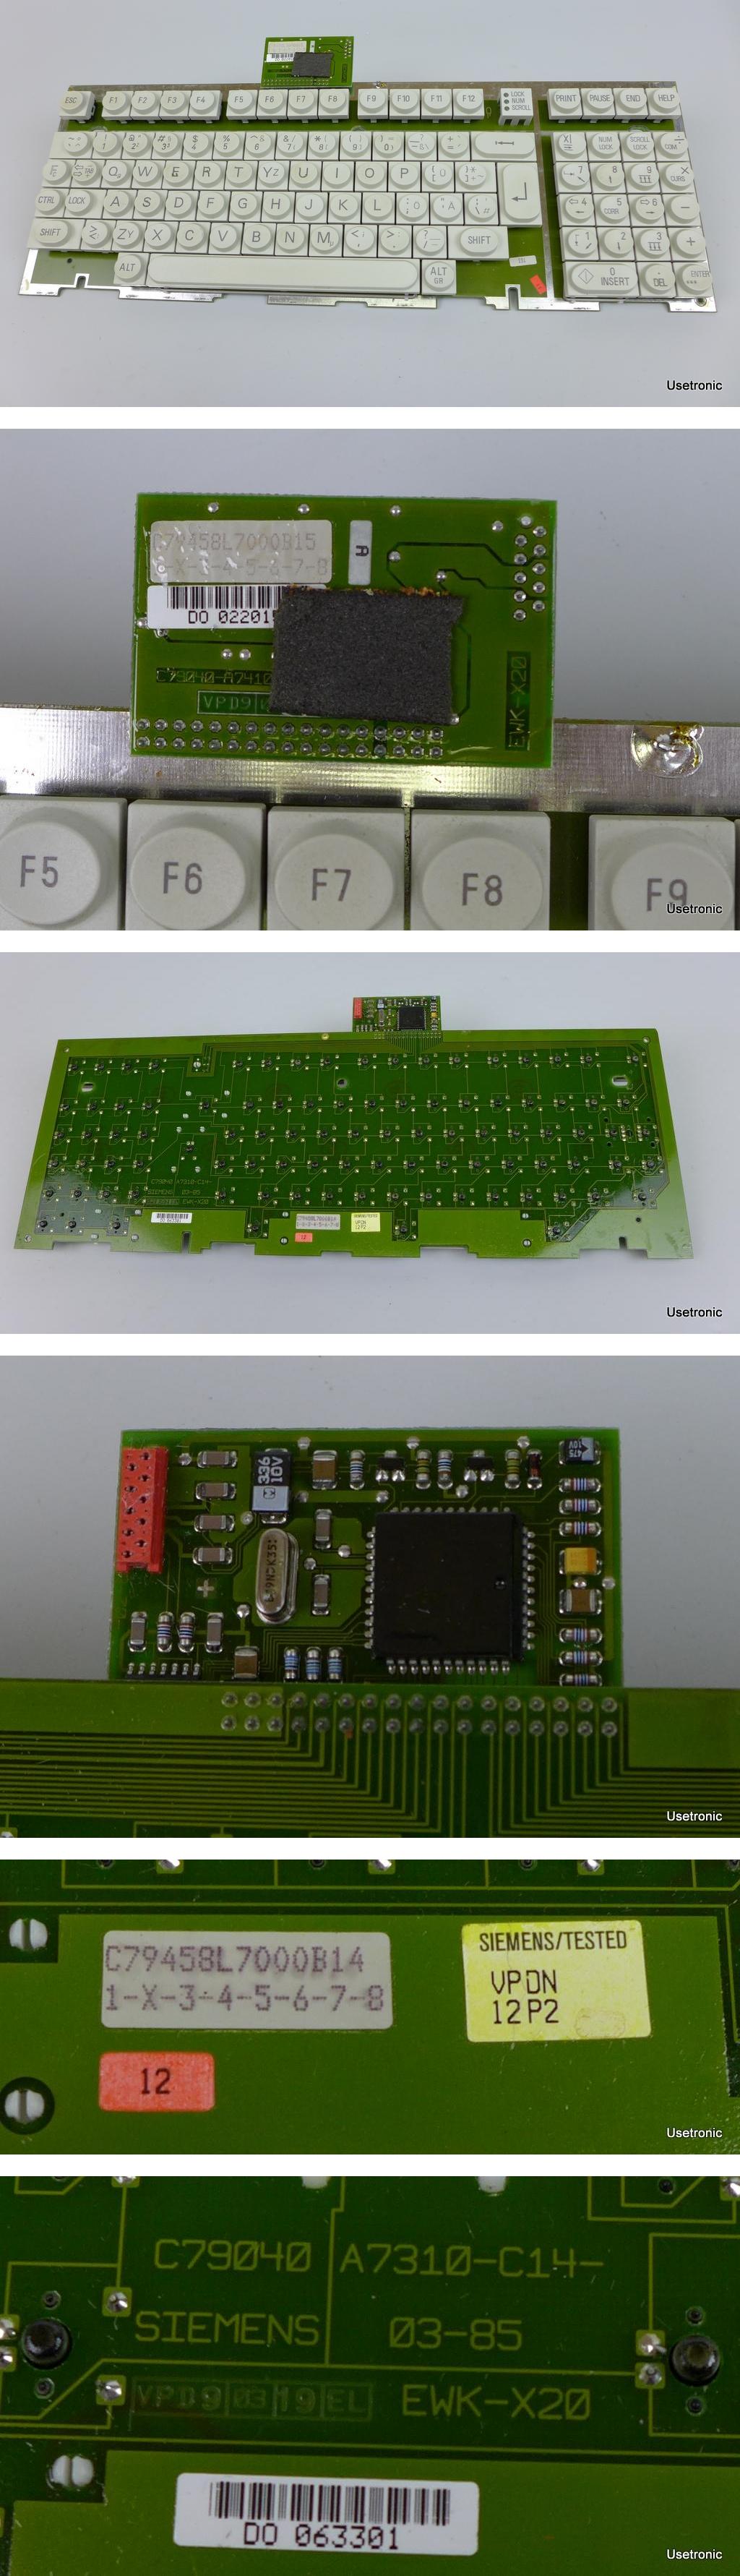 Siemens C79458-L7000-B14